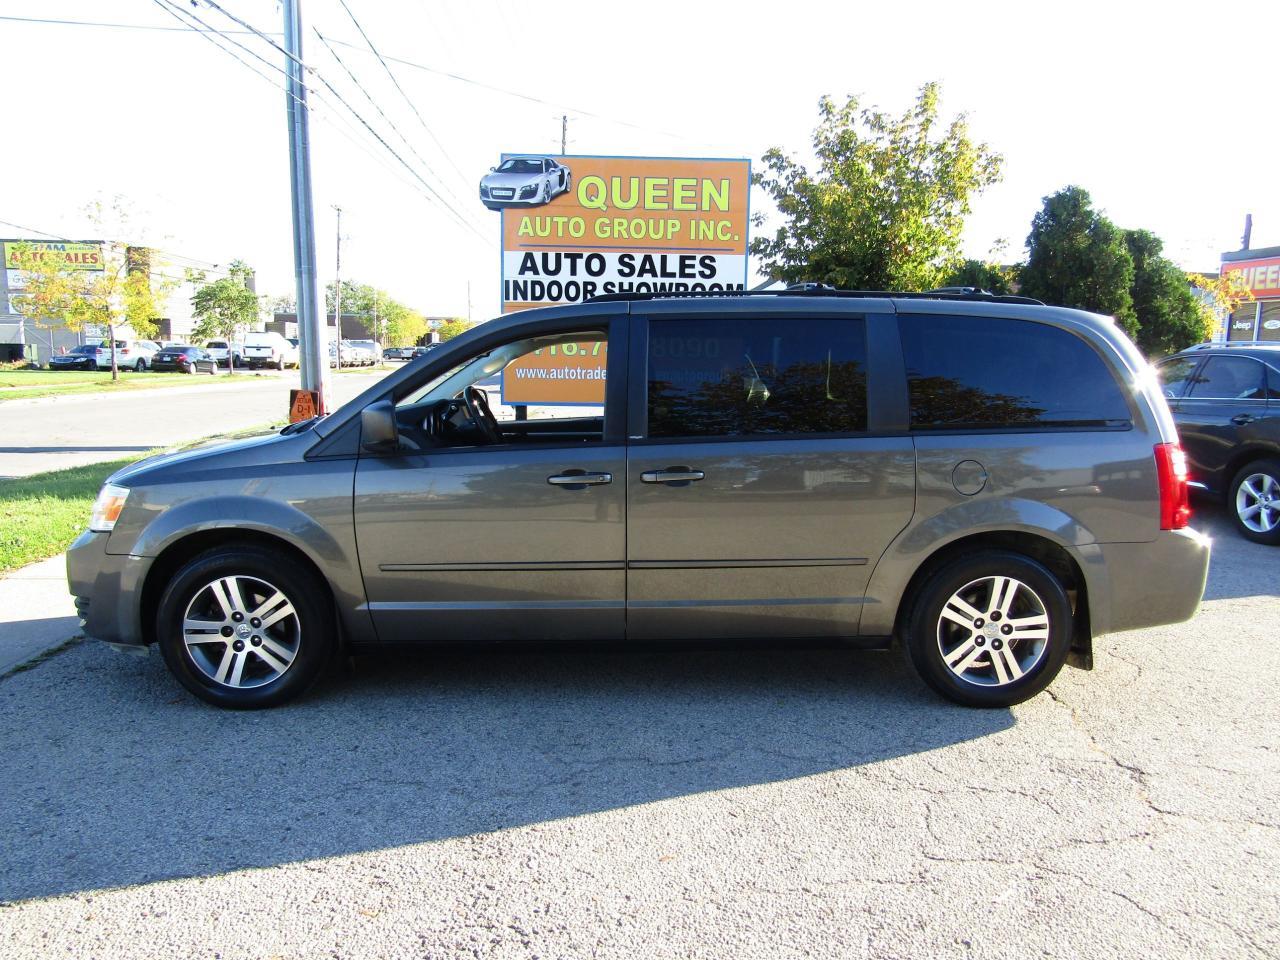 2010 Dodge Grand Caravan Stow N Go   7 Passenger   Rear DVD Unit